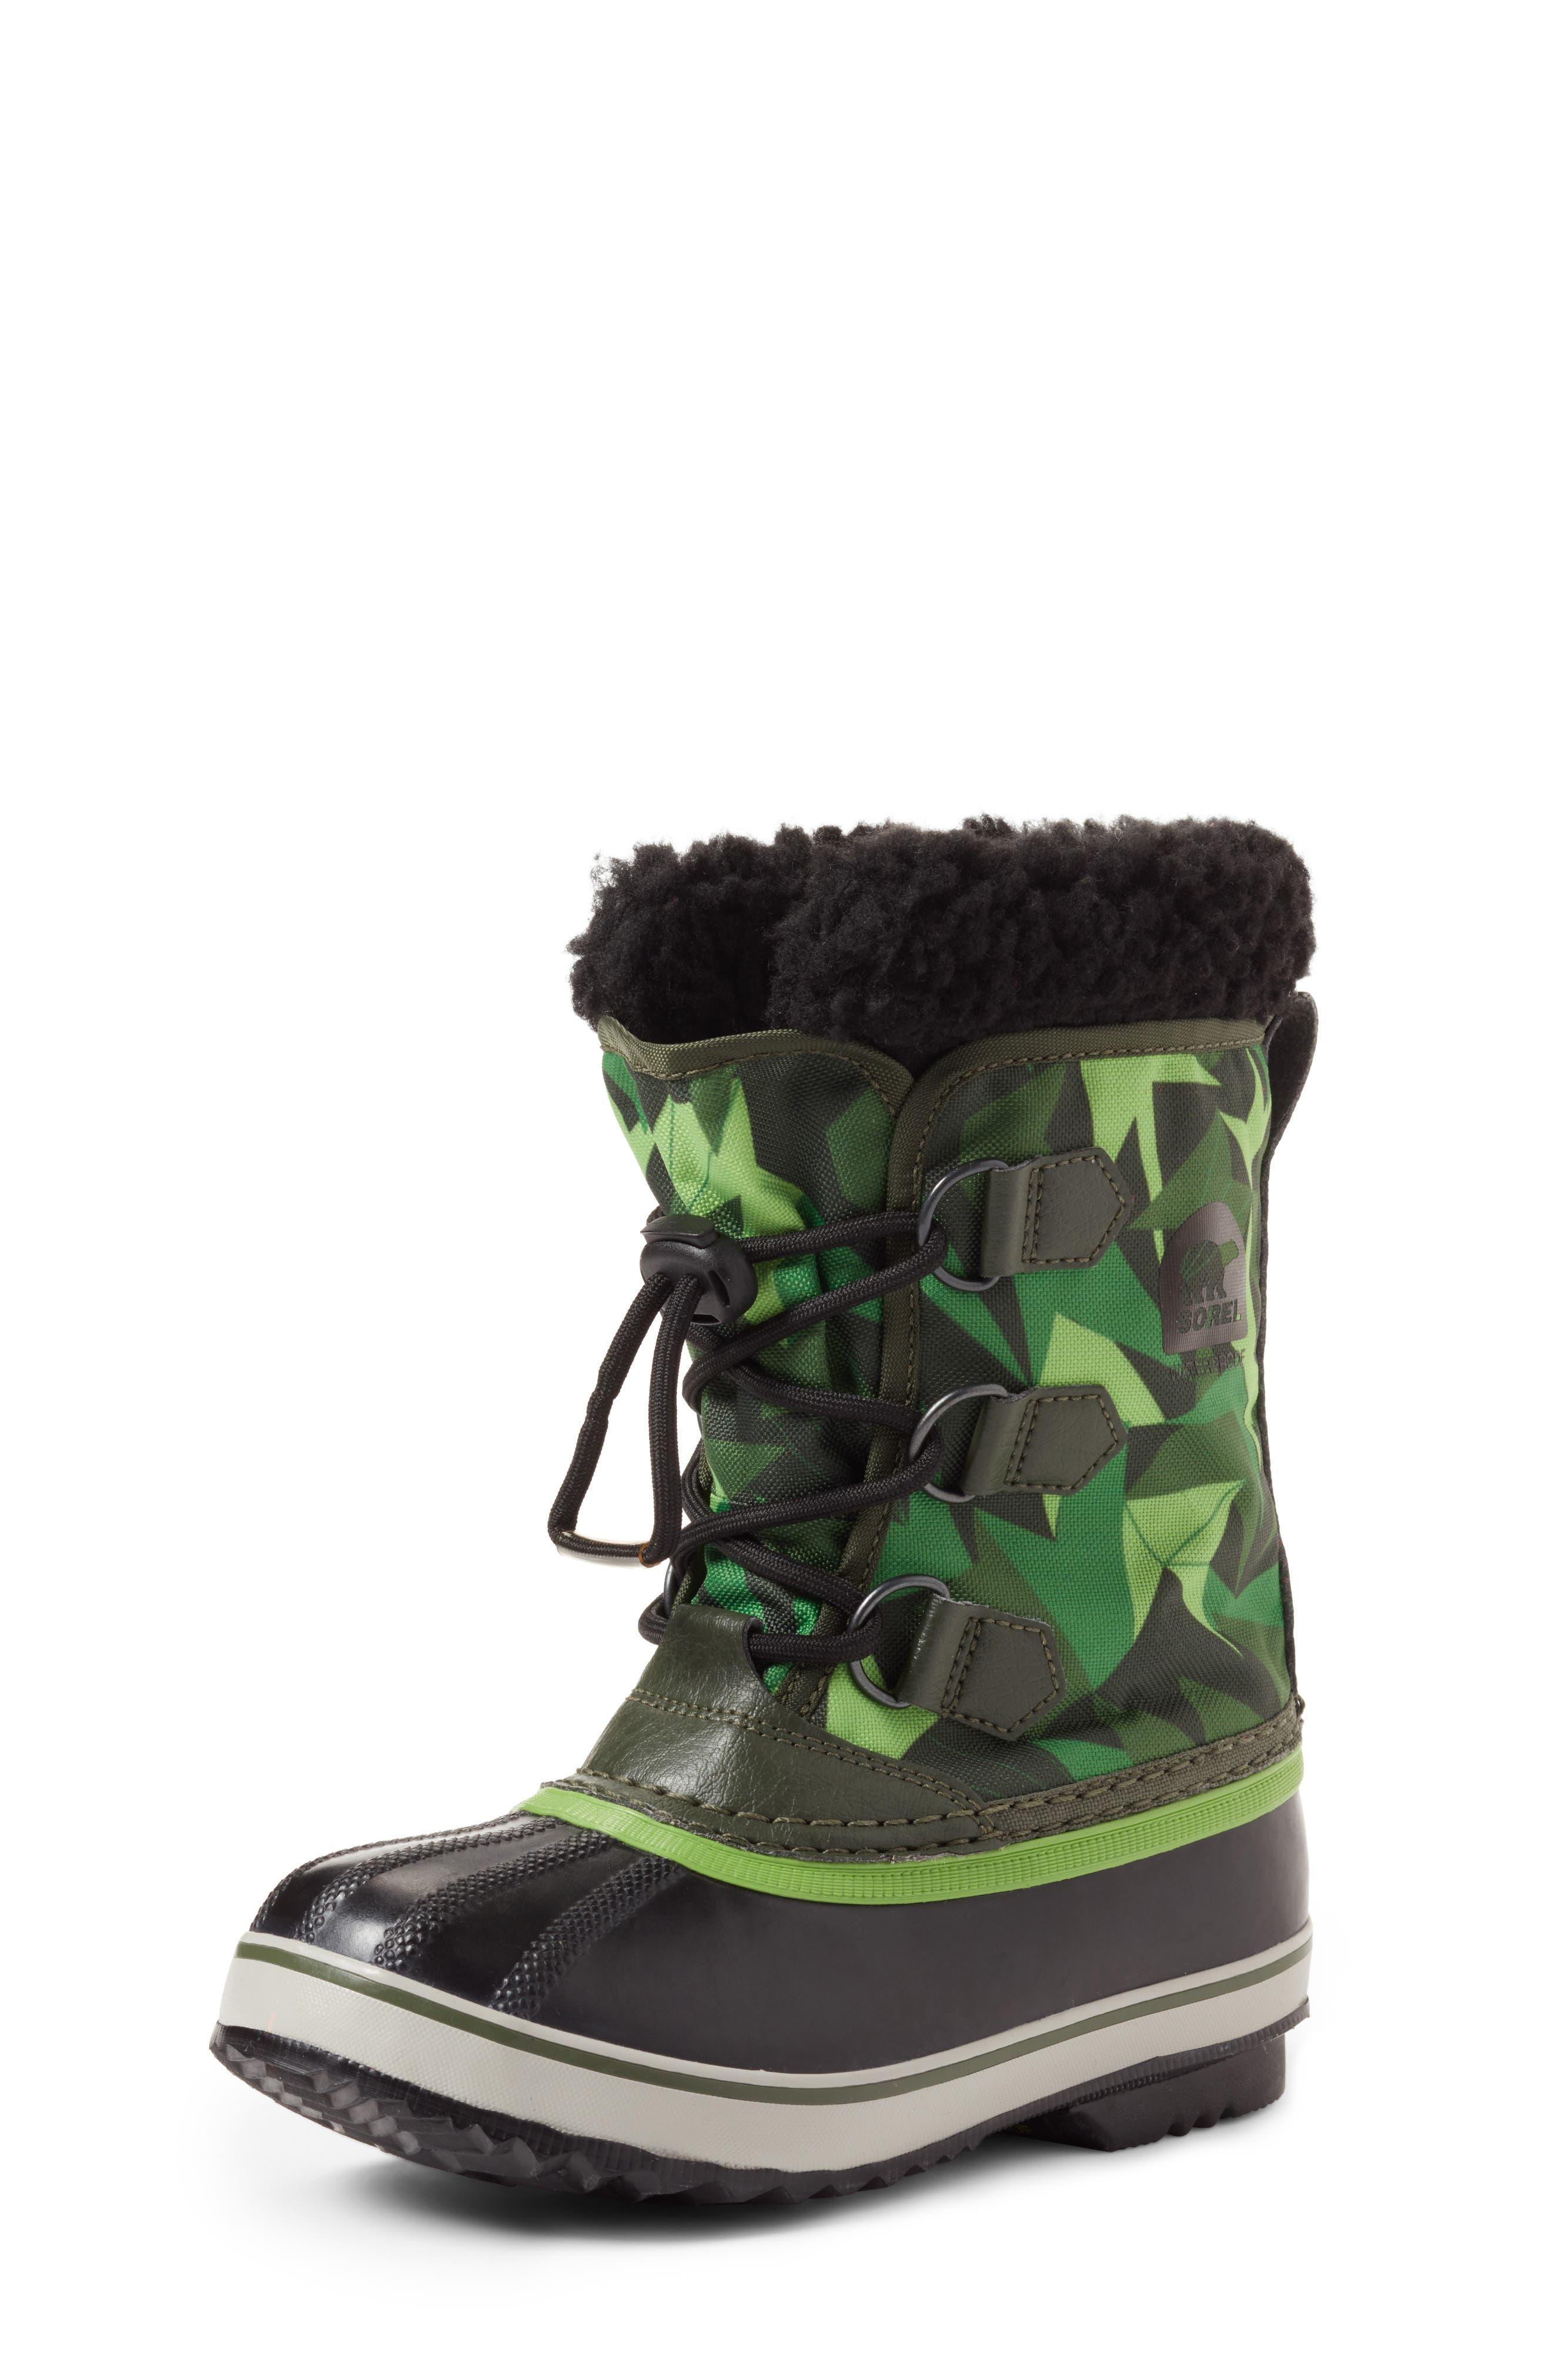 SOREL Yoot Pac Waterproof Insulated Snow Boot (Toddler, Little Kid & Big Kid )